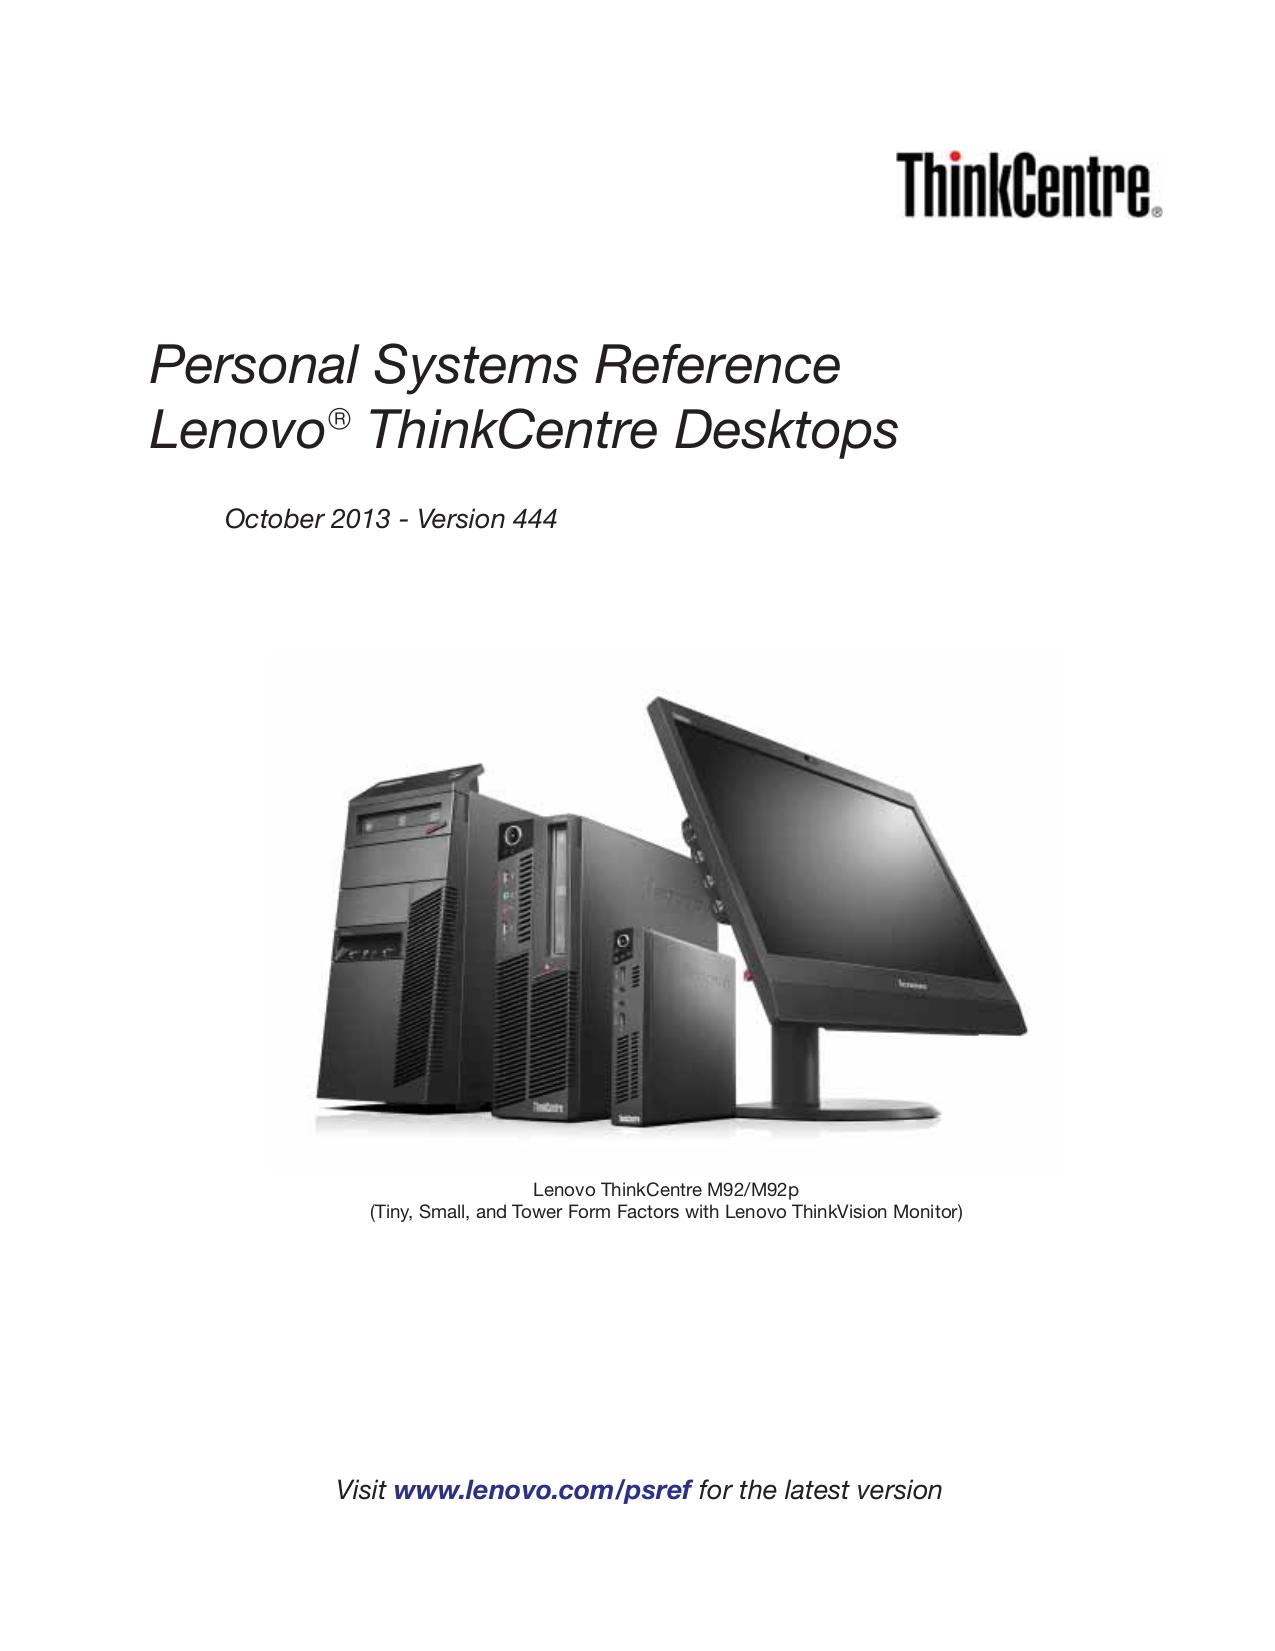 pdf for Lenovo Desktop ThinkCentre M90p 5536 manual